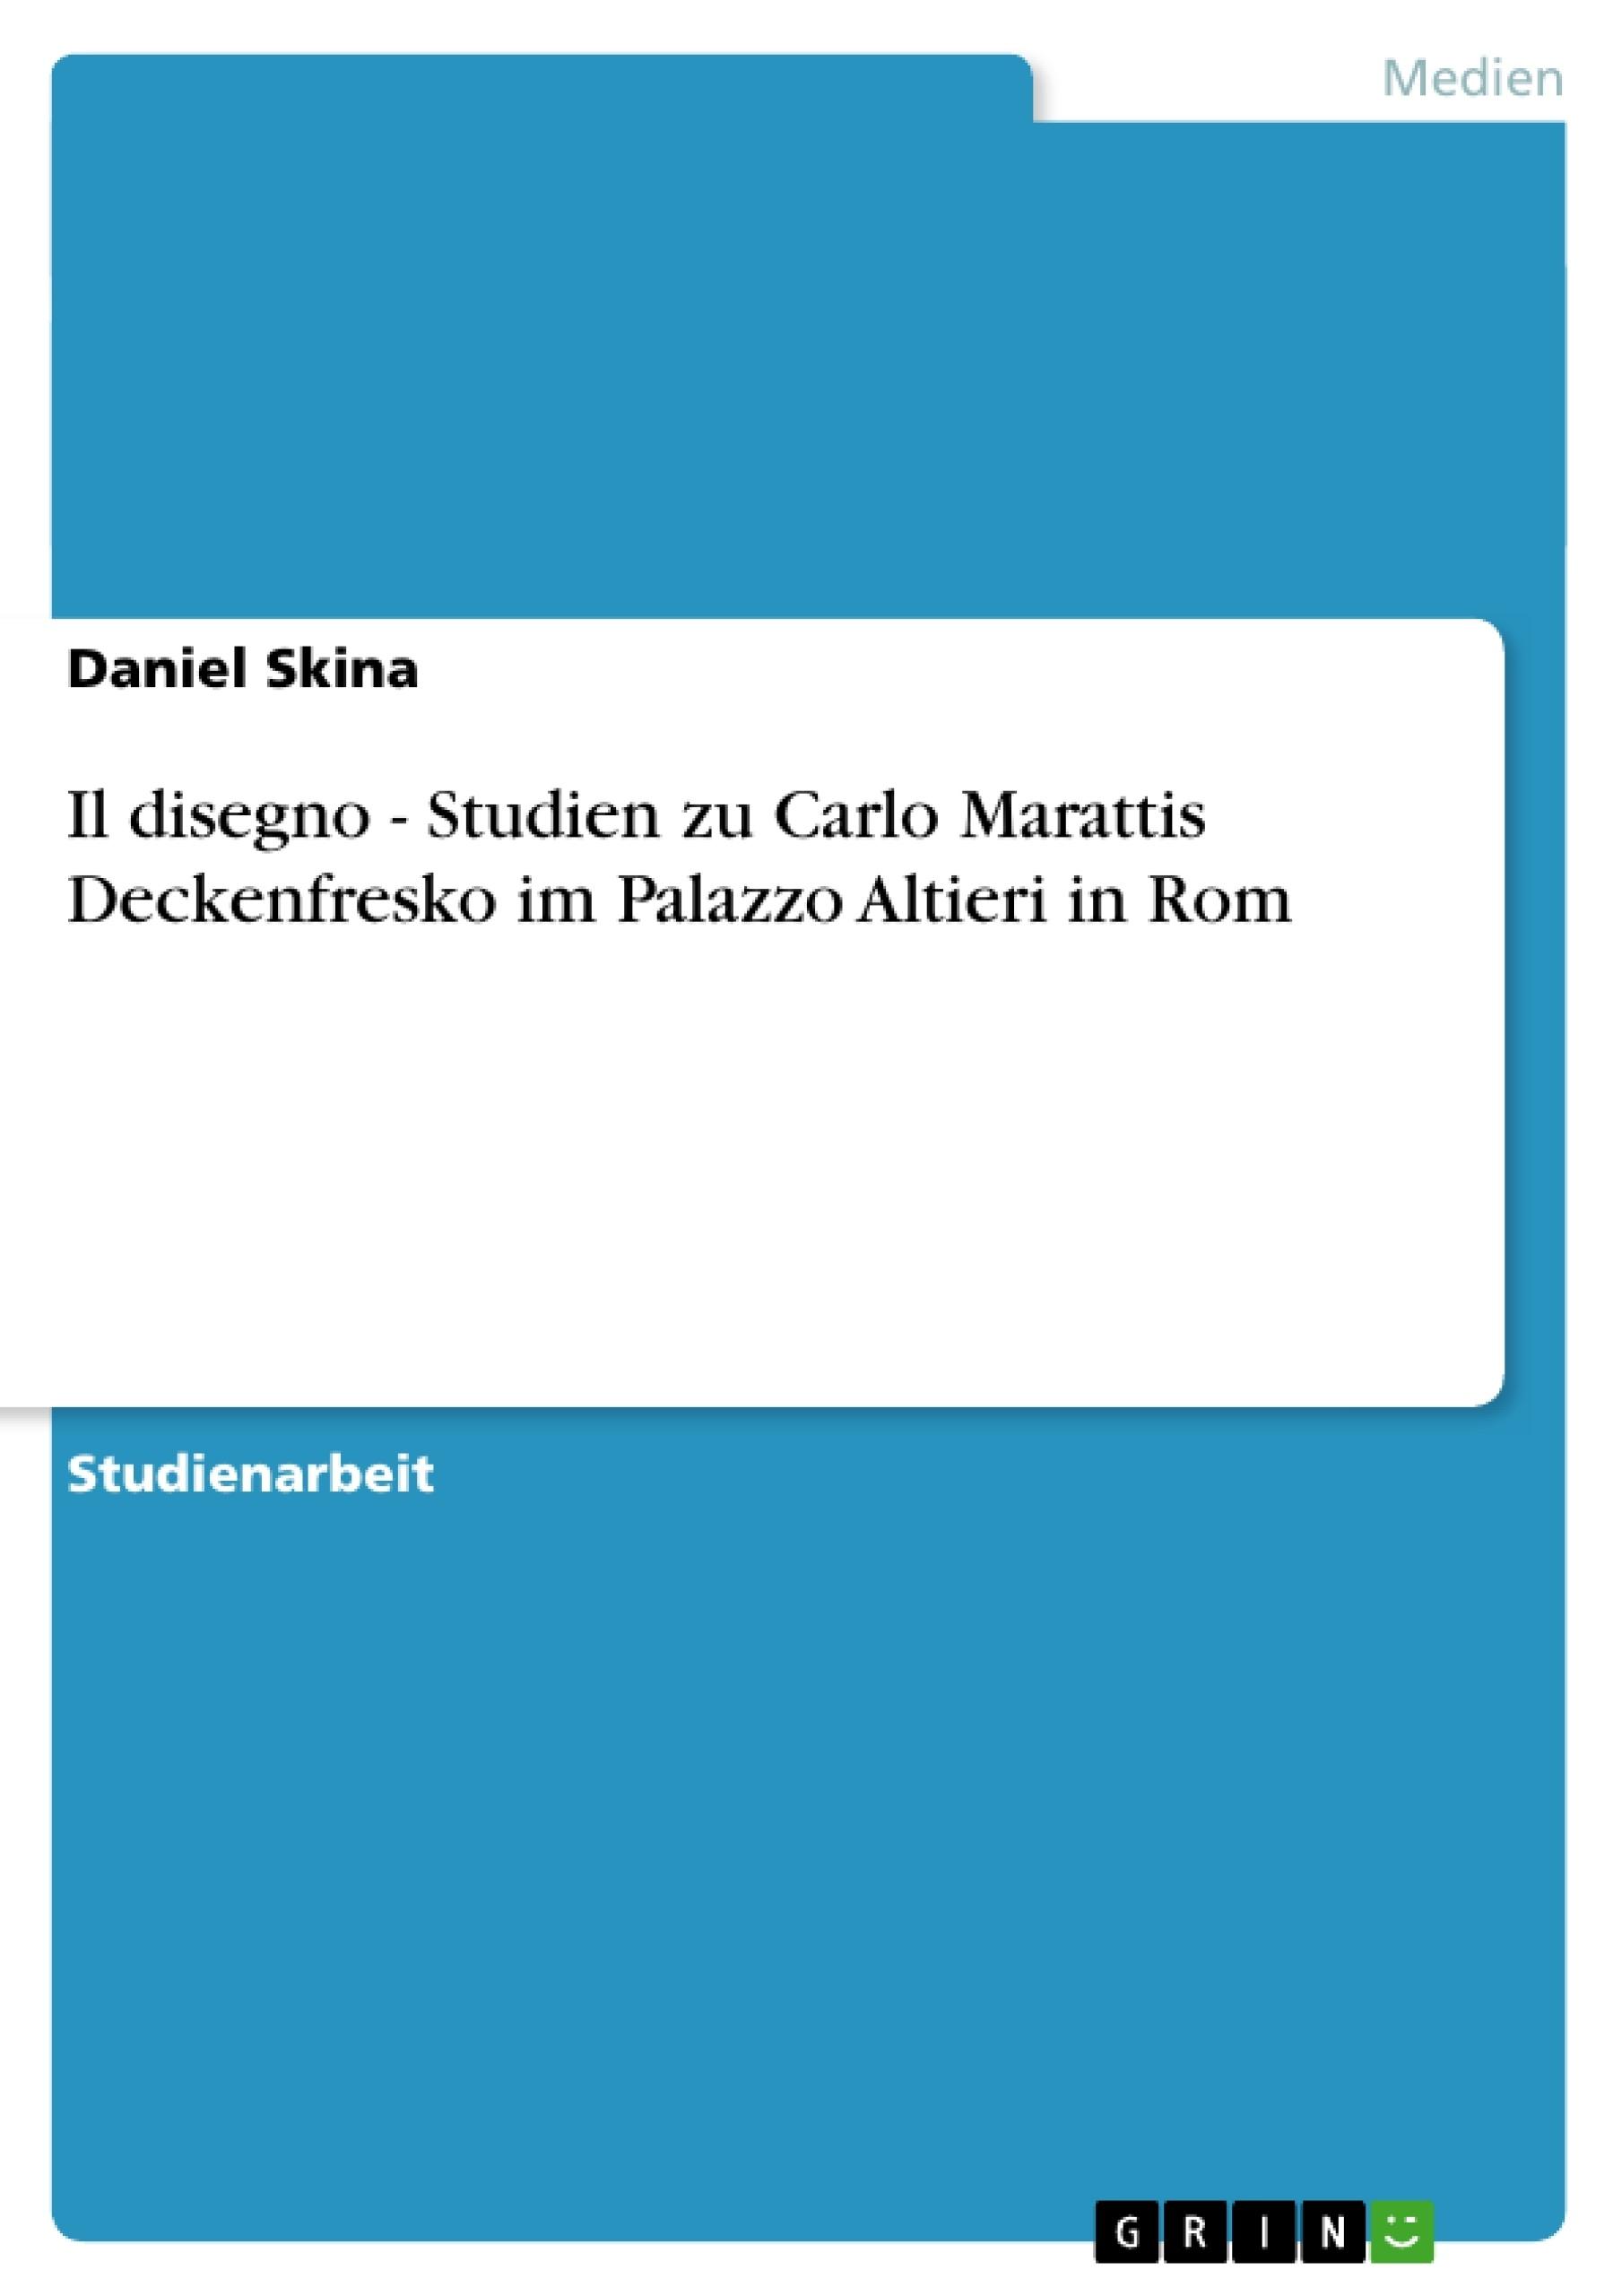 Titel: Il disegno - Studien zu Carlo Marattis Deckenfresko im Palazzo Altieri in Rom